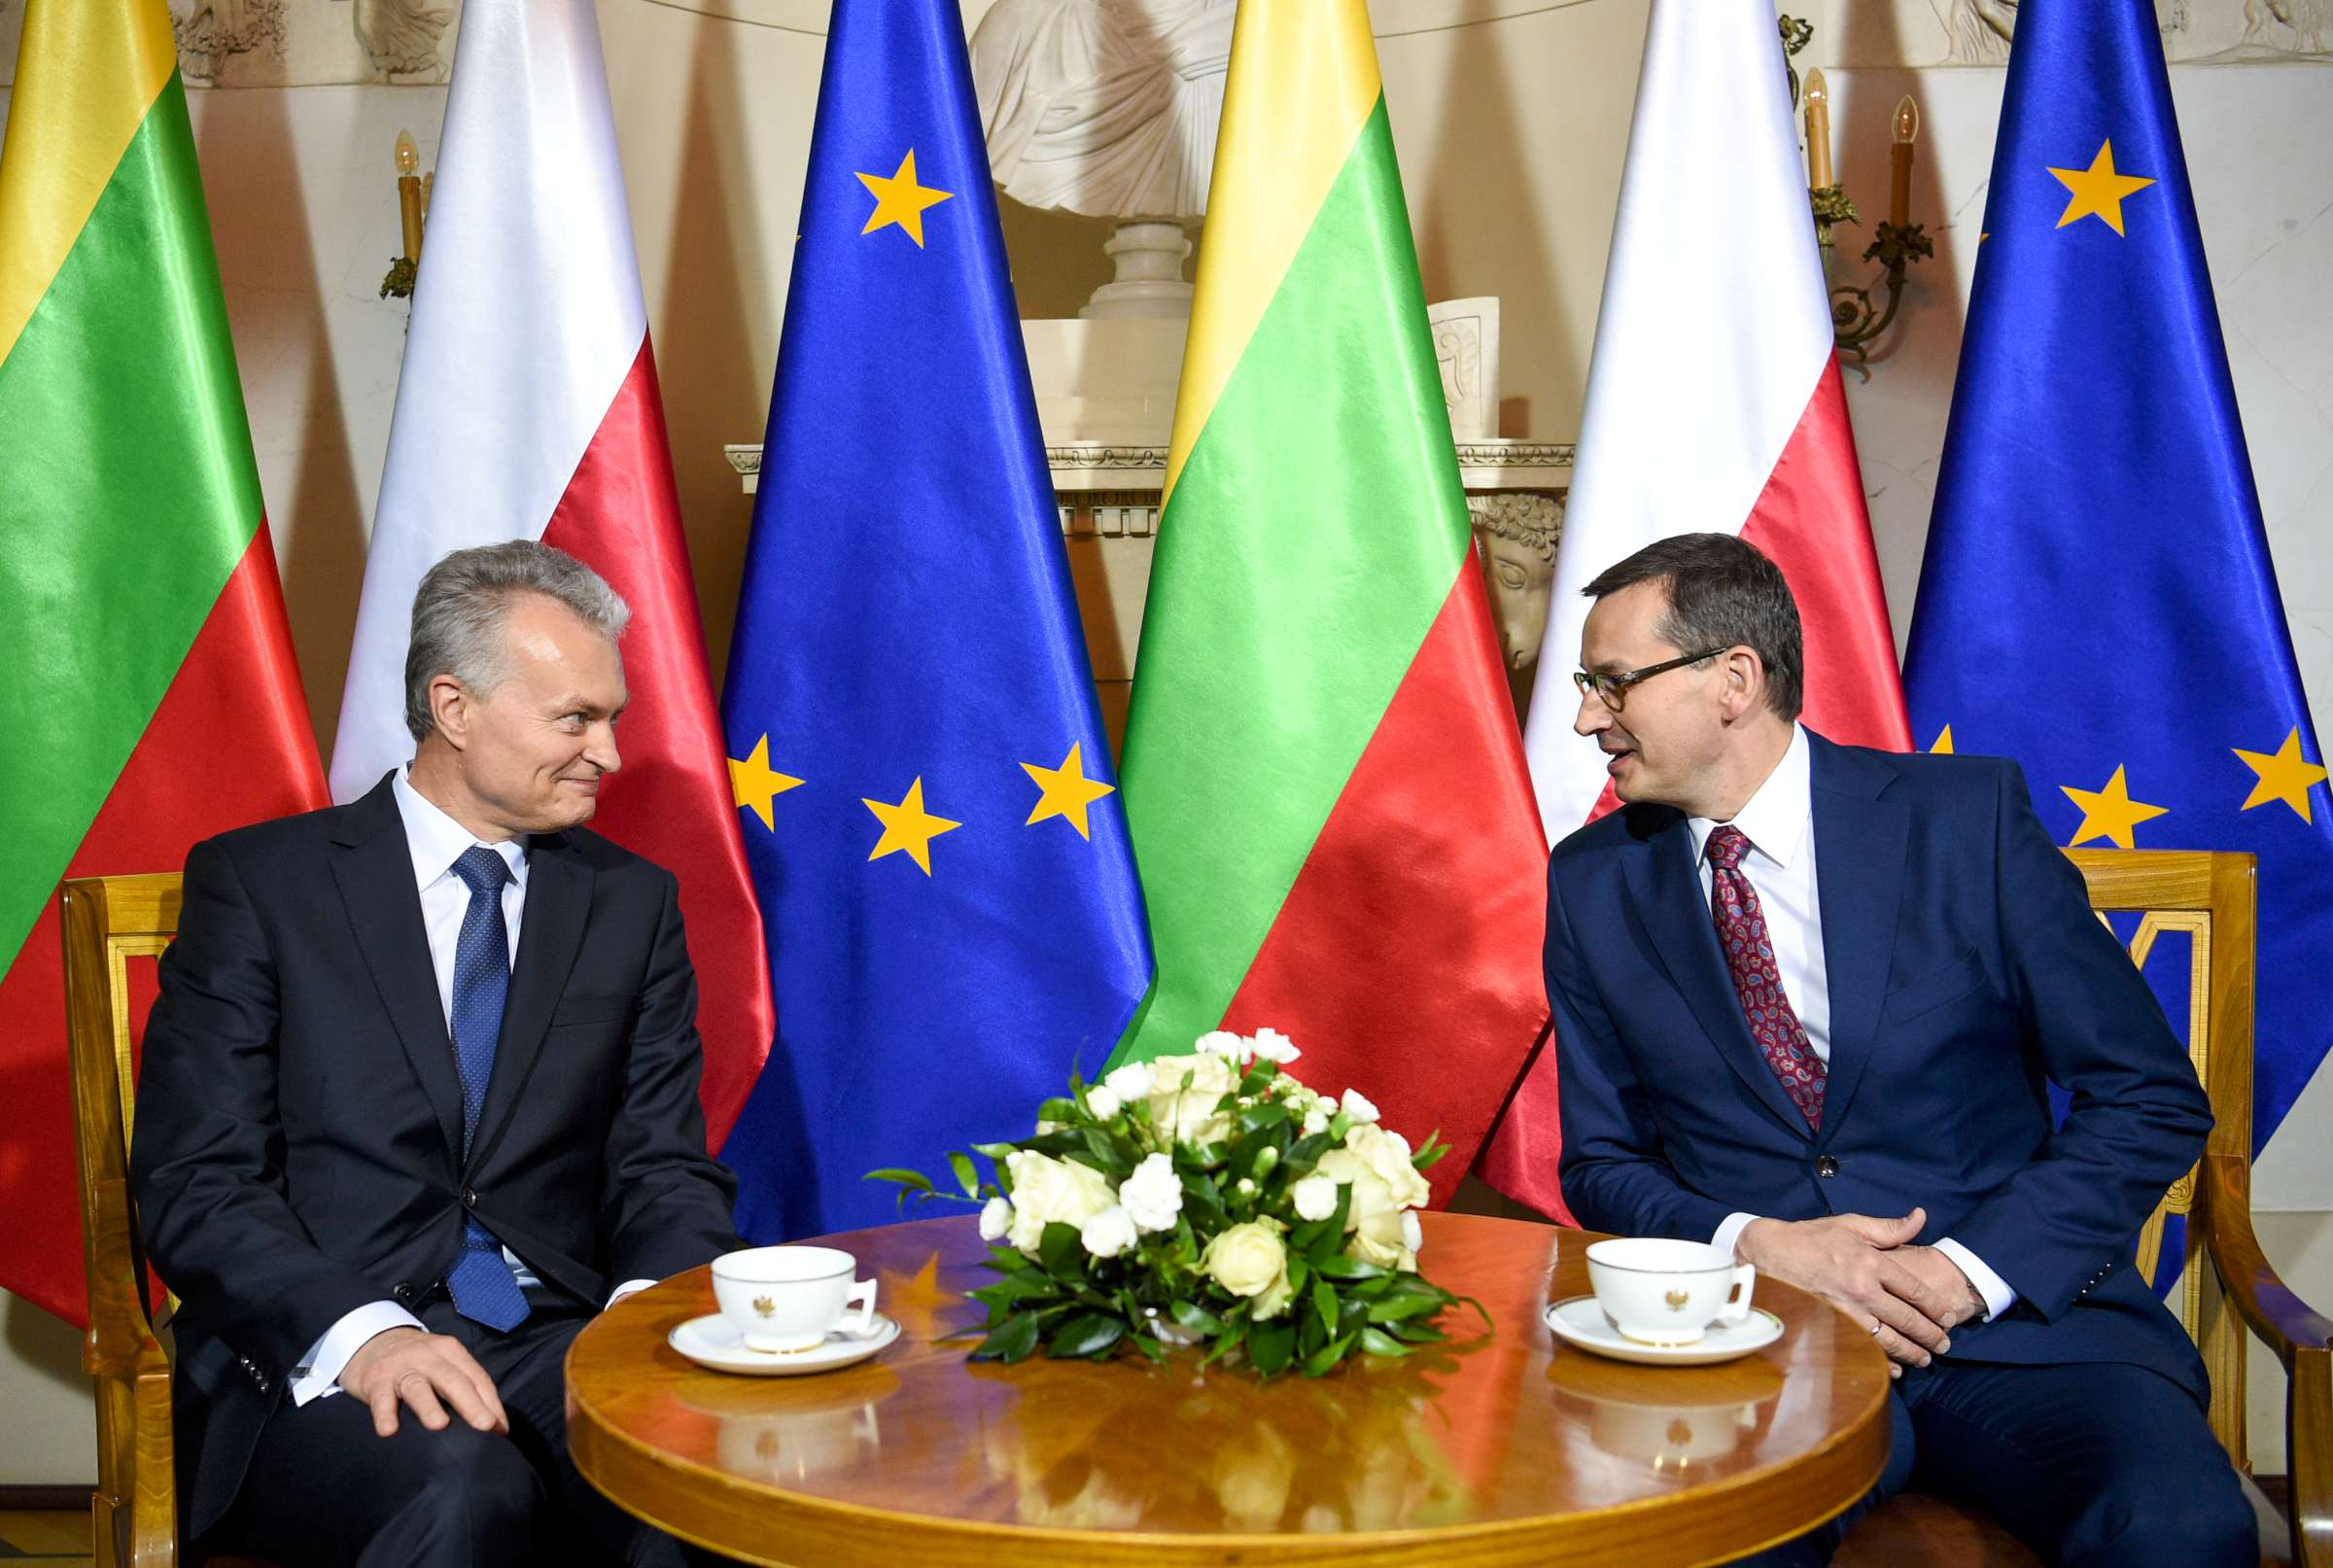 Lietuvos prezidentas Gitanas Nausėda su Lenkijos Seimo Pirmininku Mareku Kuchčinskiu   lrp.lt, R. Dačkaus nuotr.